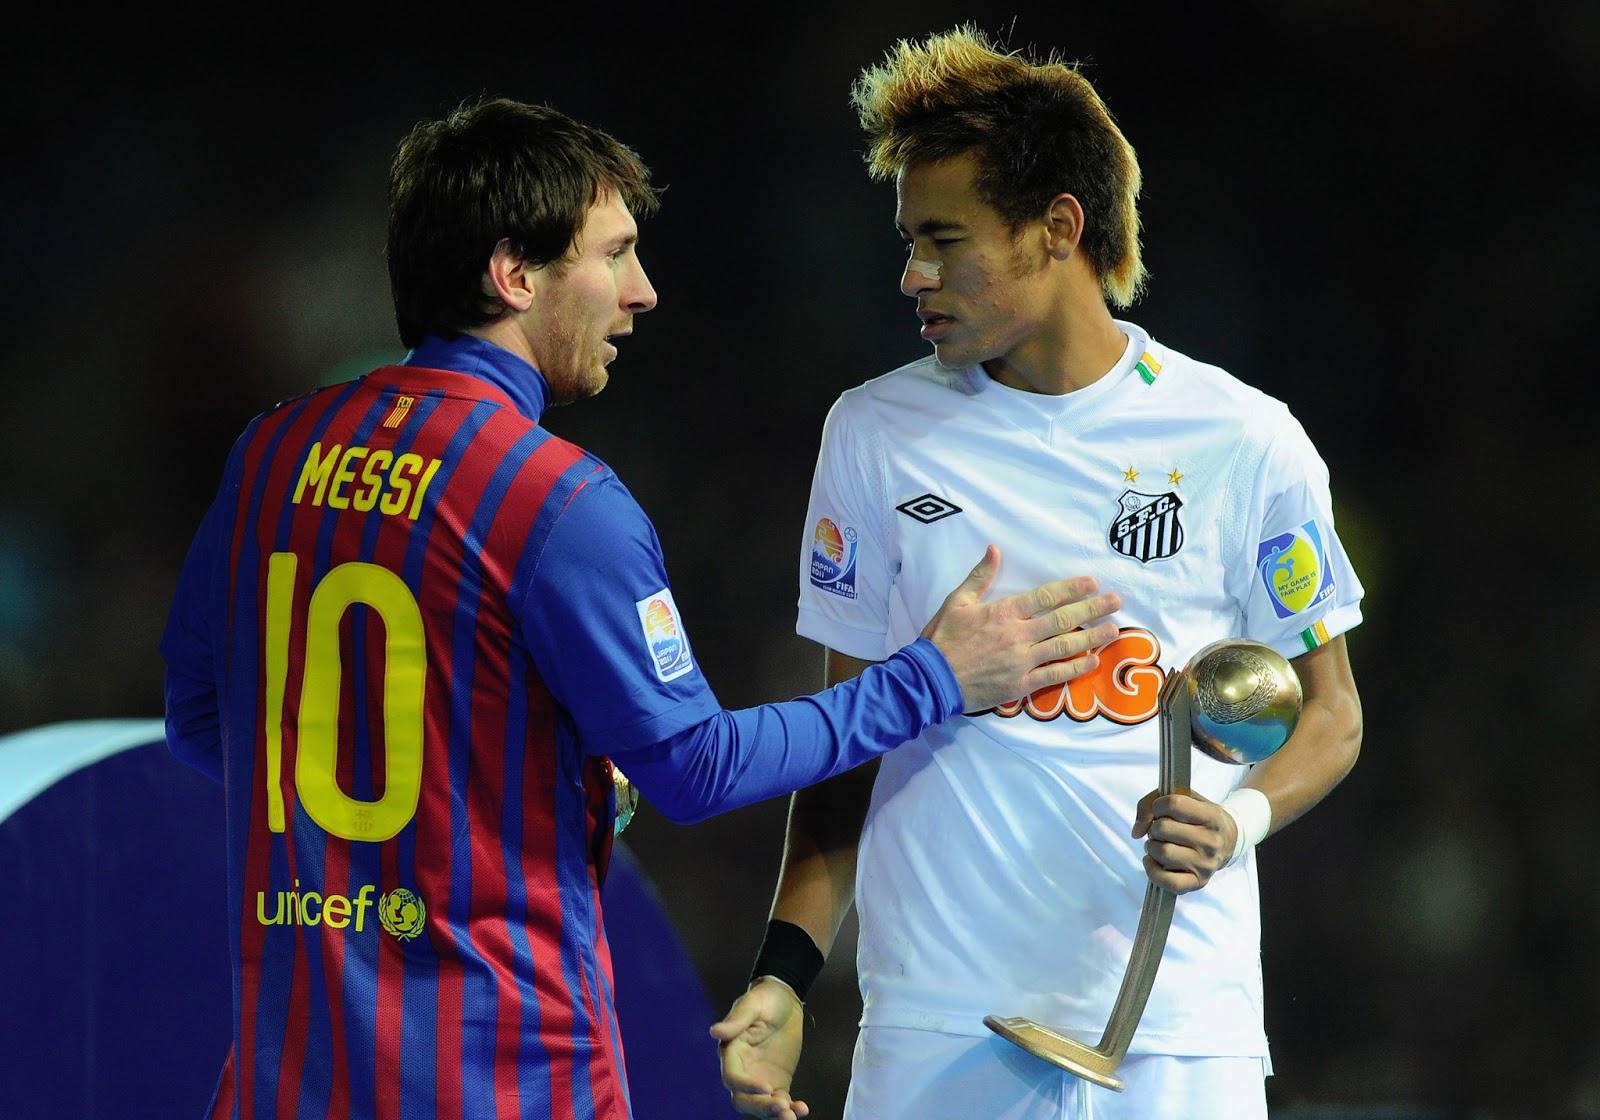 Lionel Messi Barcelona and Neymar Santos Wallpaper HD FULL HD 1600x1120